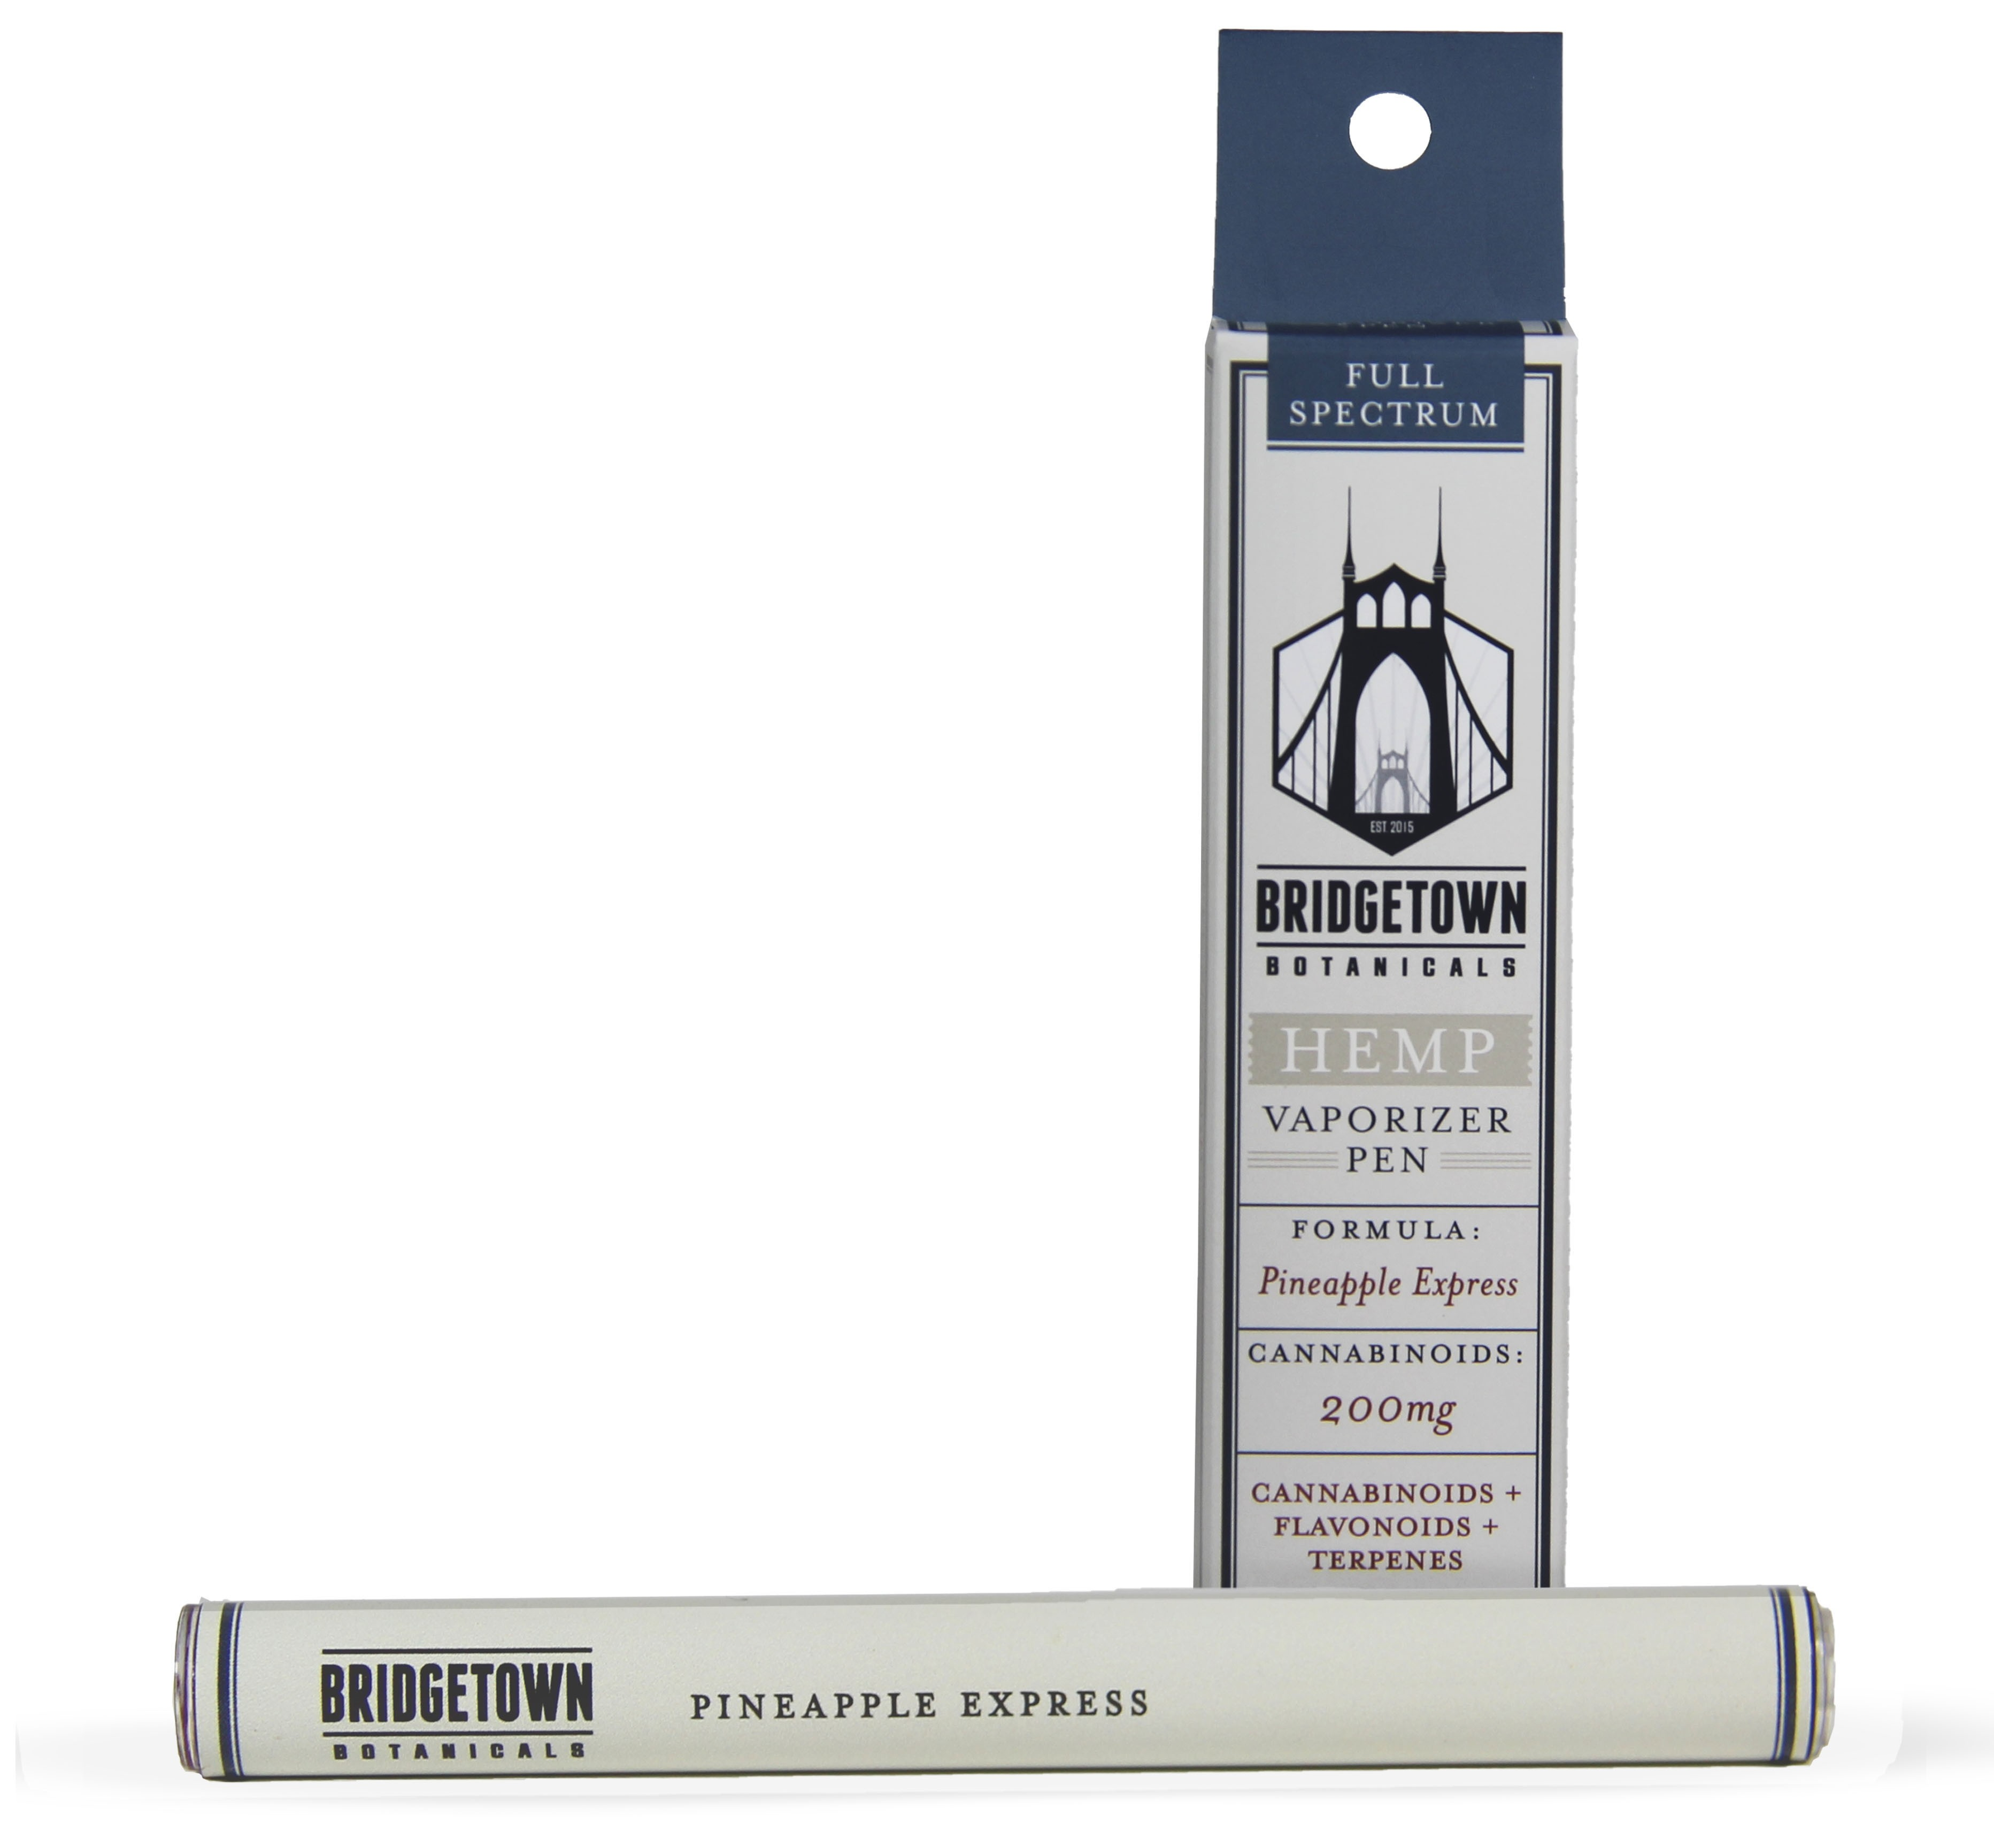 Hemp Vaporizer Pen - 200mg (Pineapple Express)